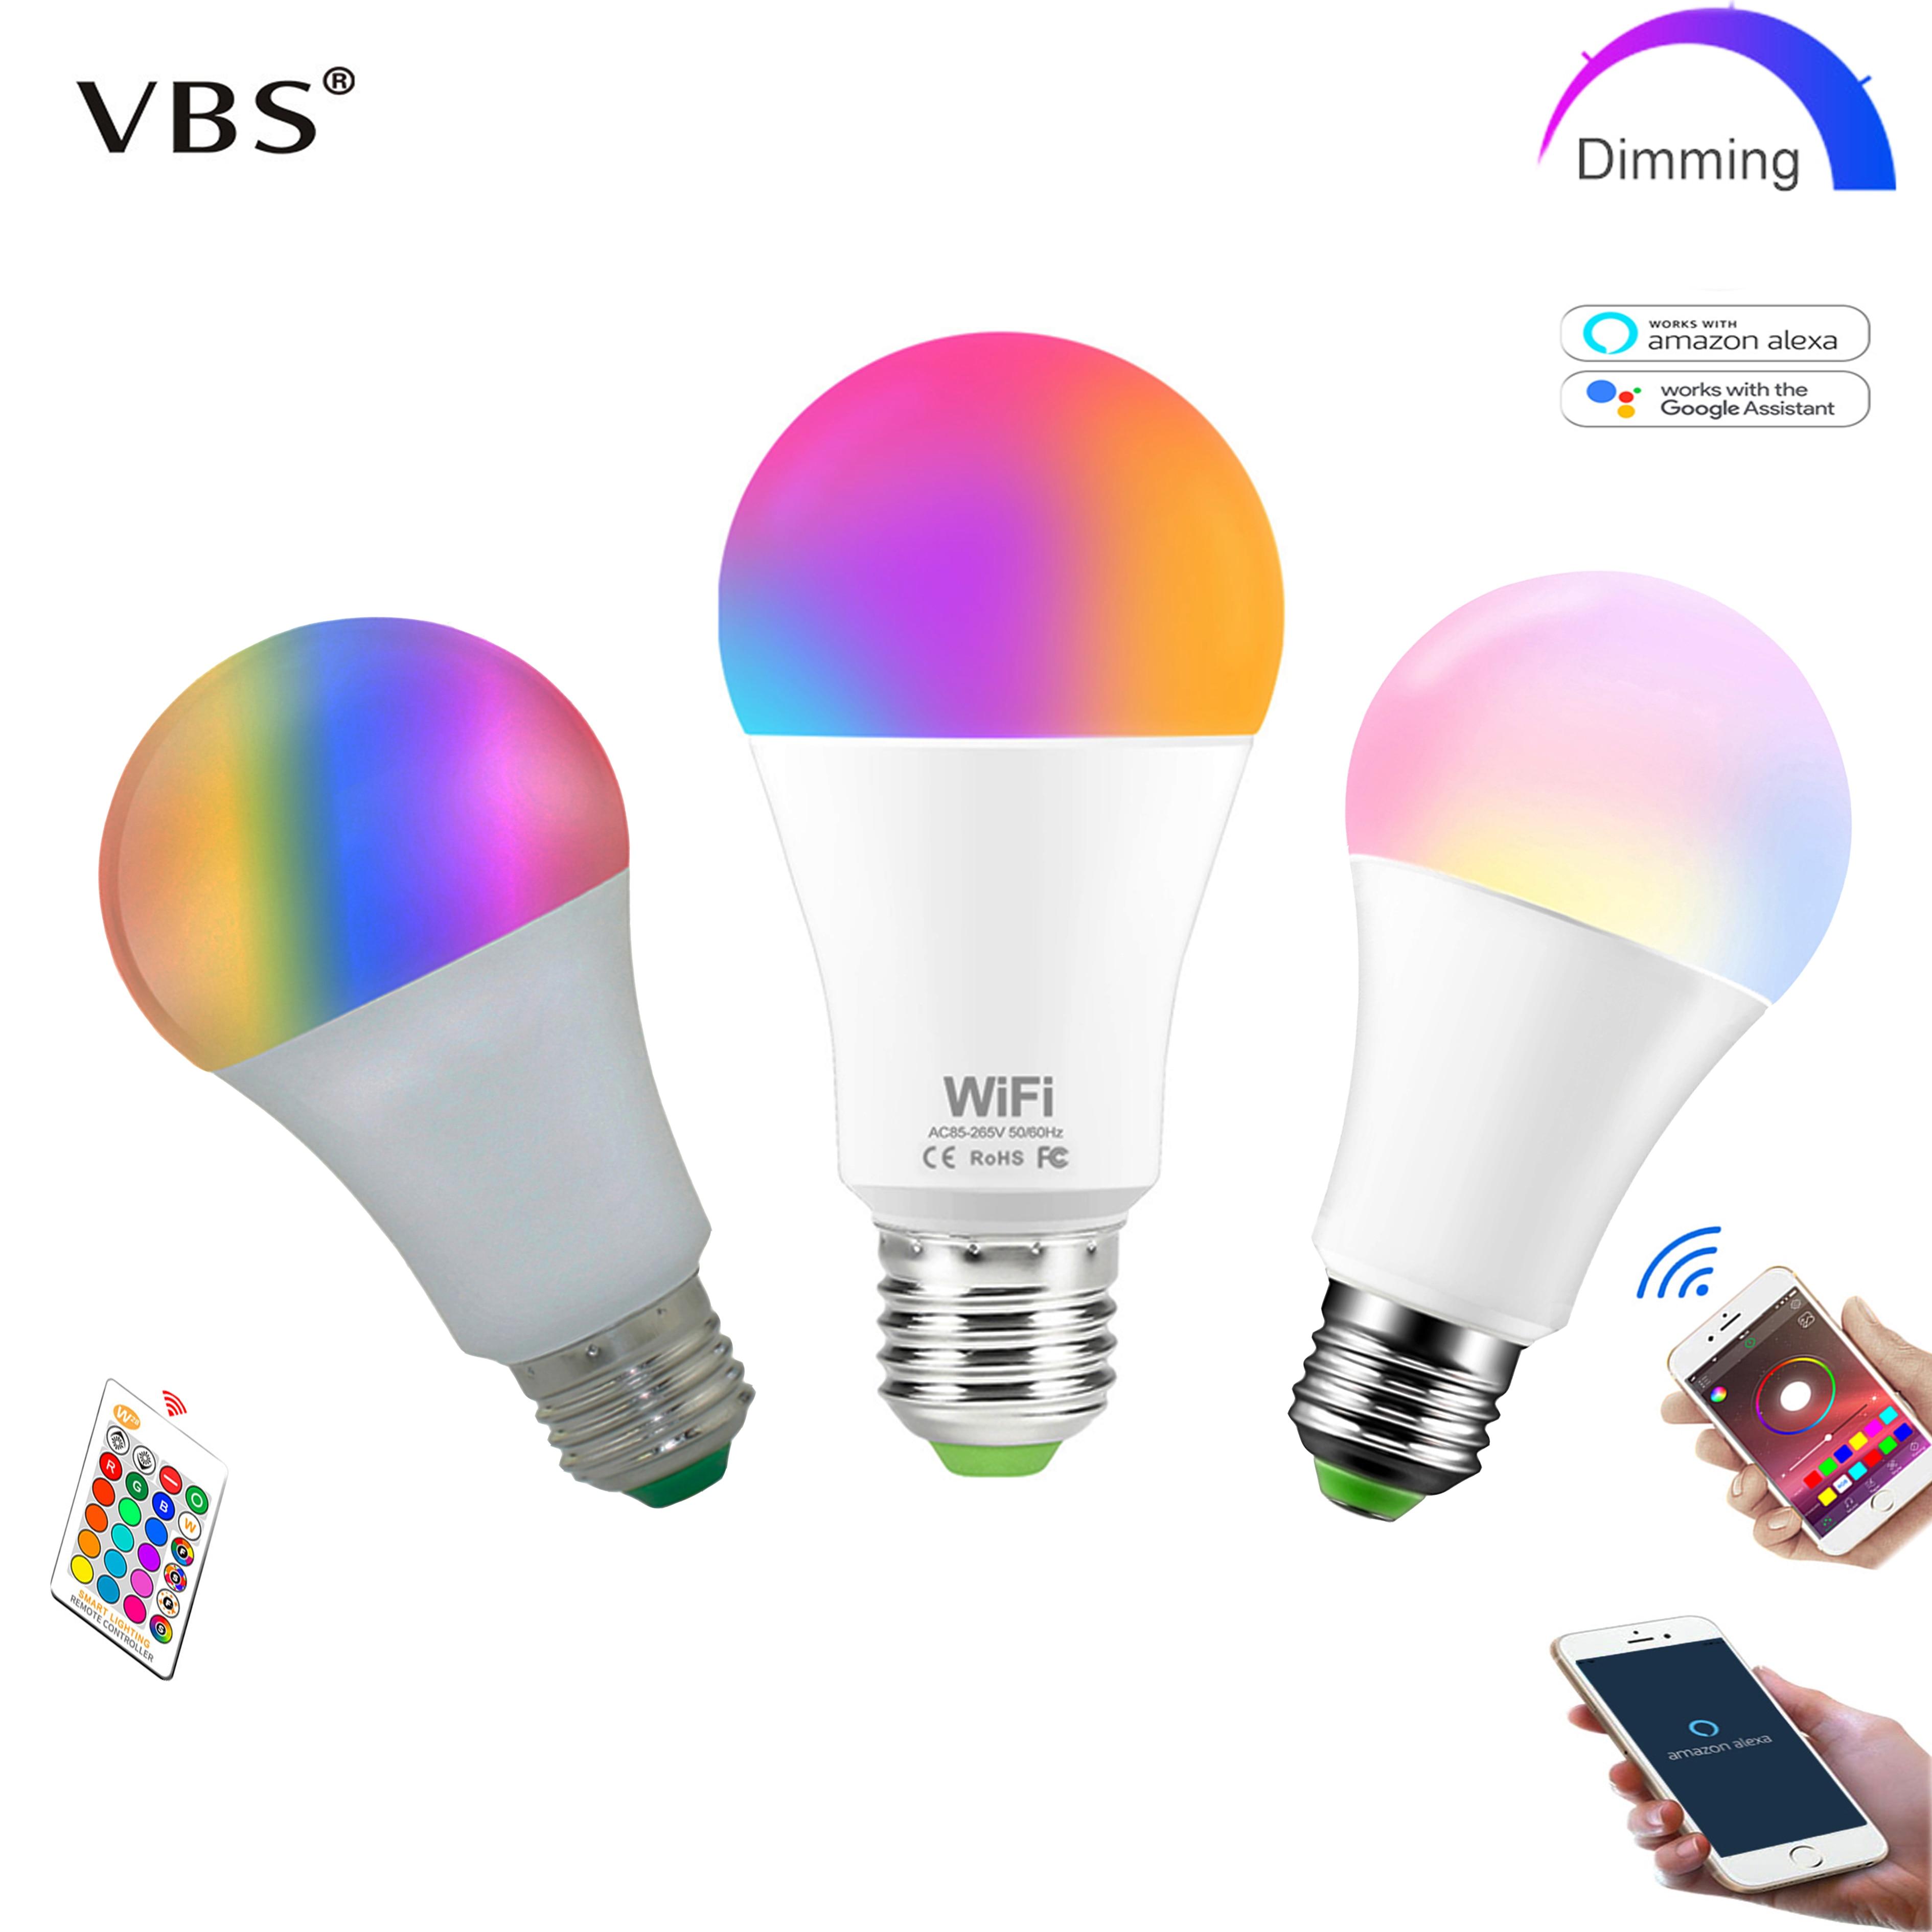 Dimmable E27 LED Lamp RGB 15W WIFI Smart Bulb Bluetooth  APP Control 5W 10W IR Remote Control RGBWW Light Bulb 85-265V For Home